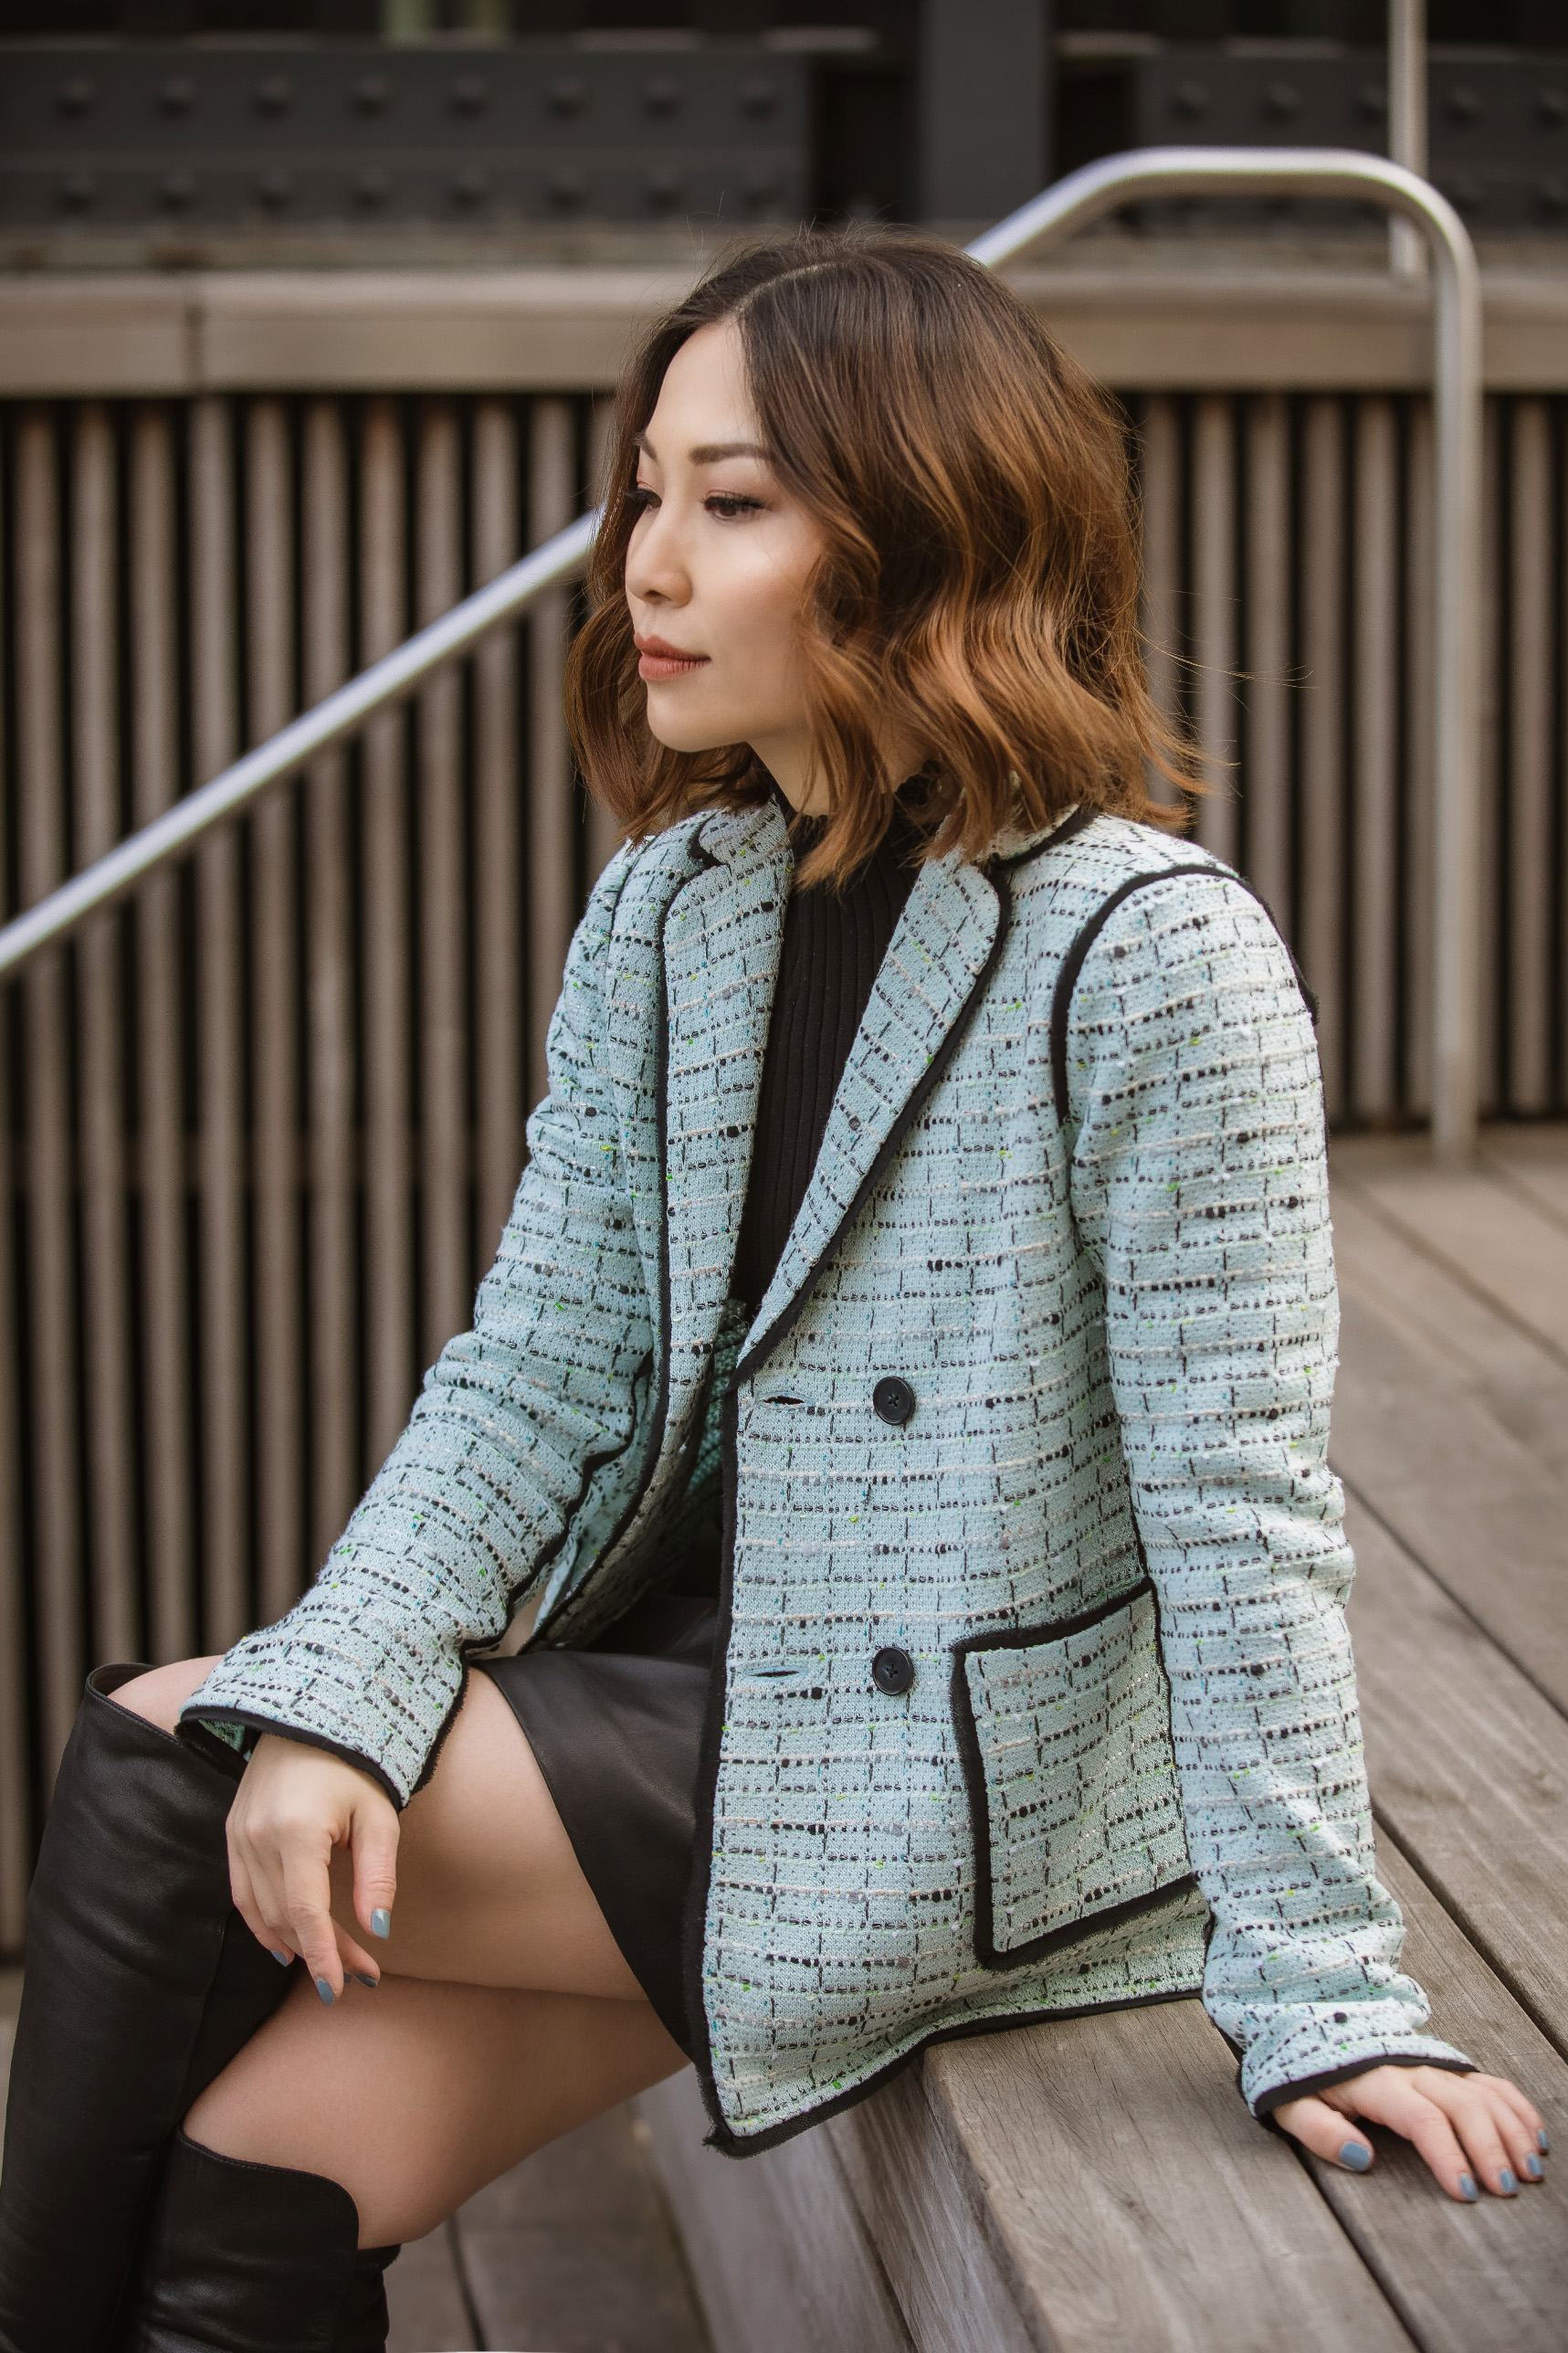 st john knits adriana multi tweed double breast jacket.JPG